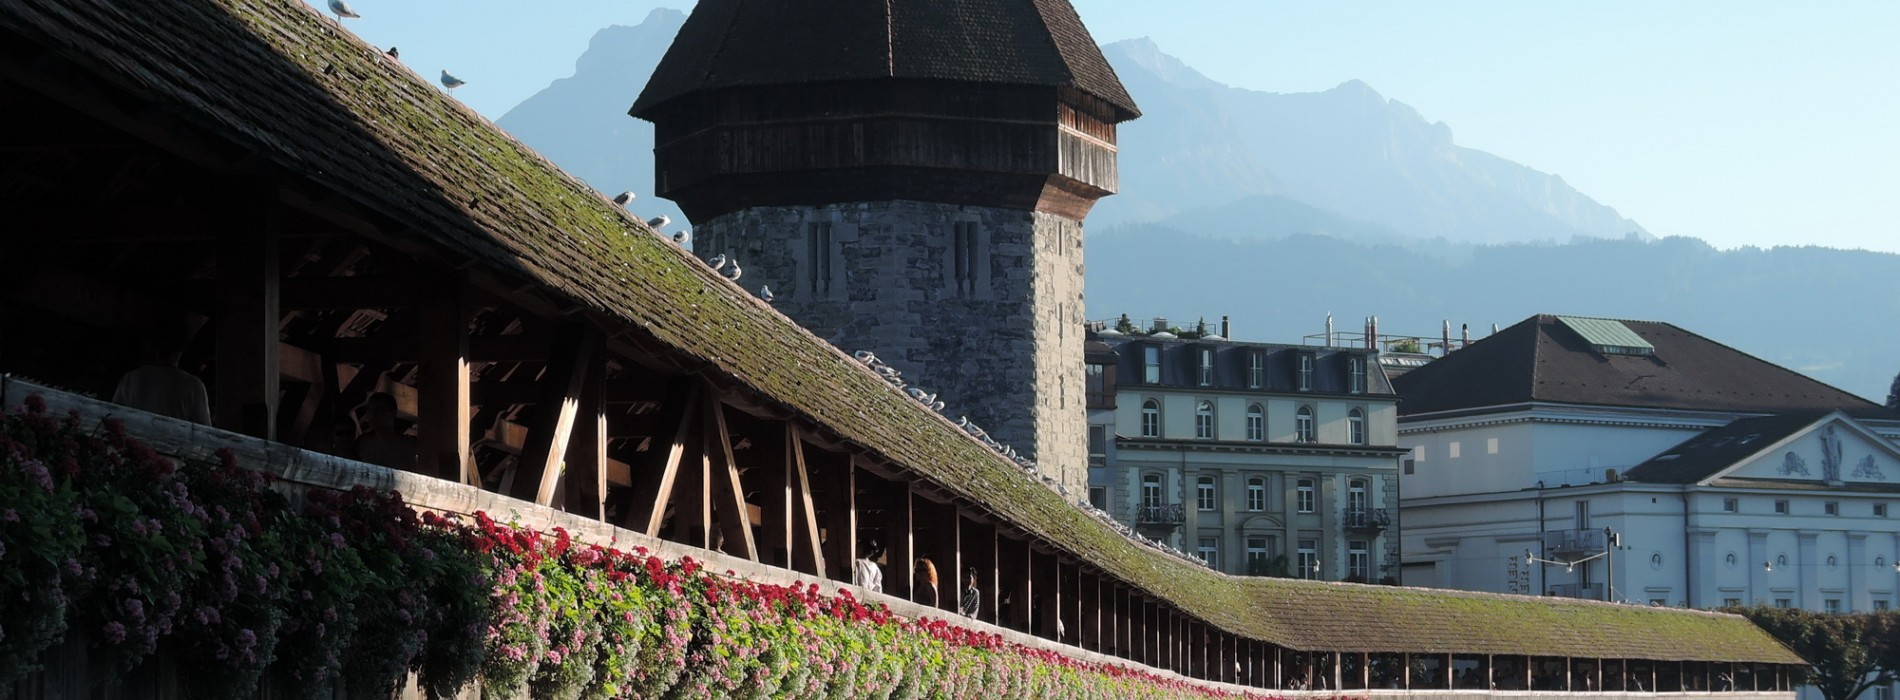 Chiều bên hồ Lucerne